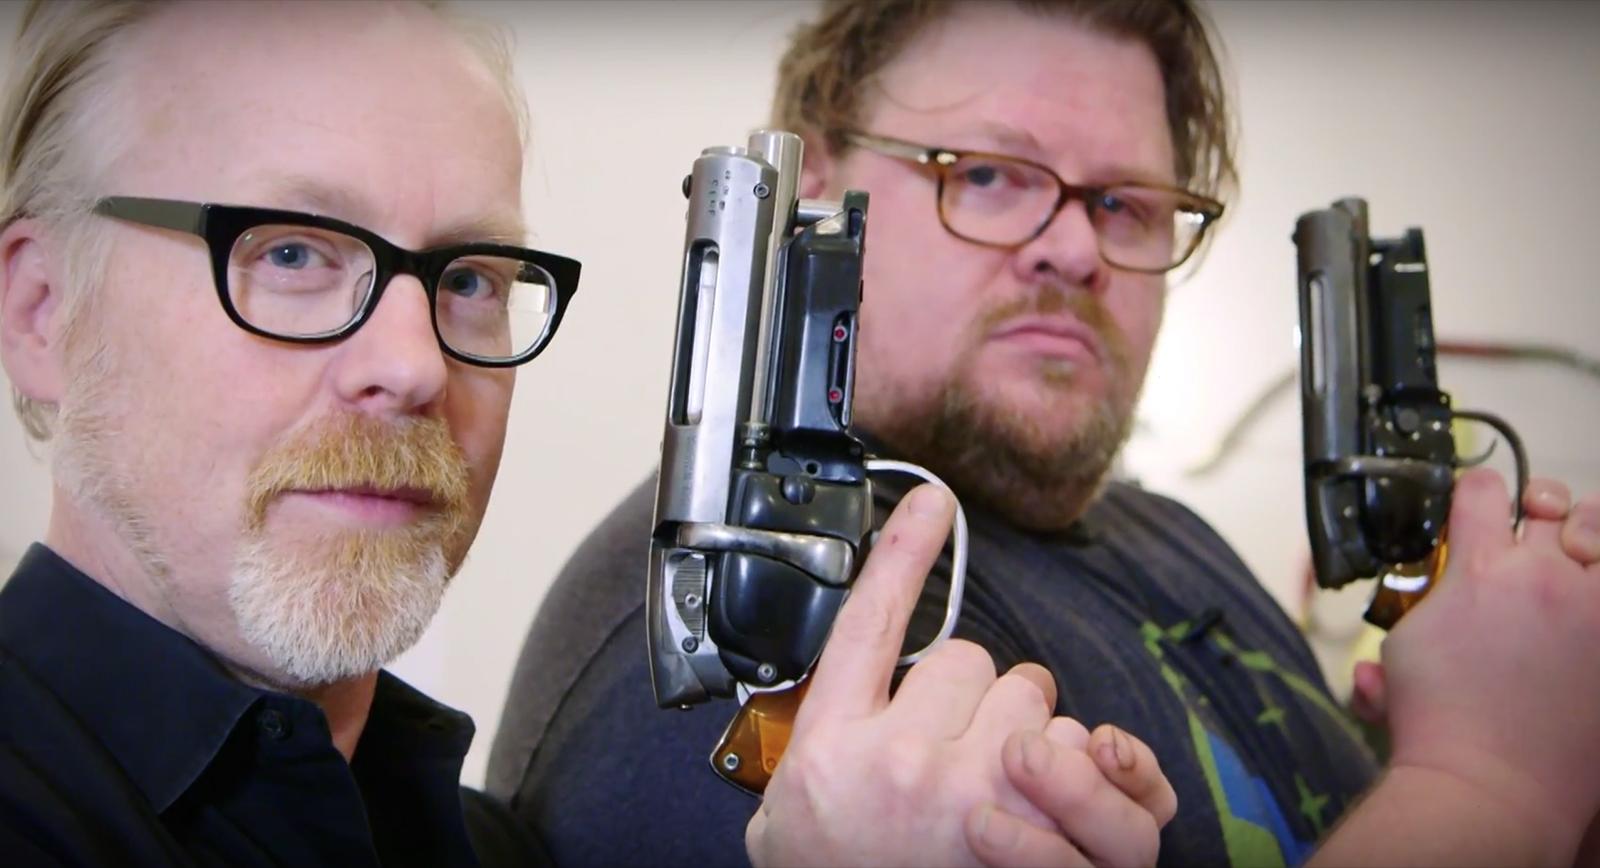 Dan-Lanigan-Blade-Runner-Deckard-Prop-Blaster-Pistol-Adam-Savage-TESTED-Video-Collection